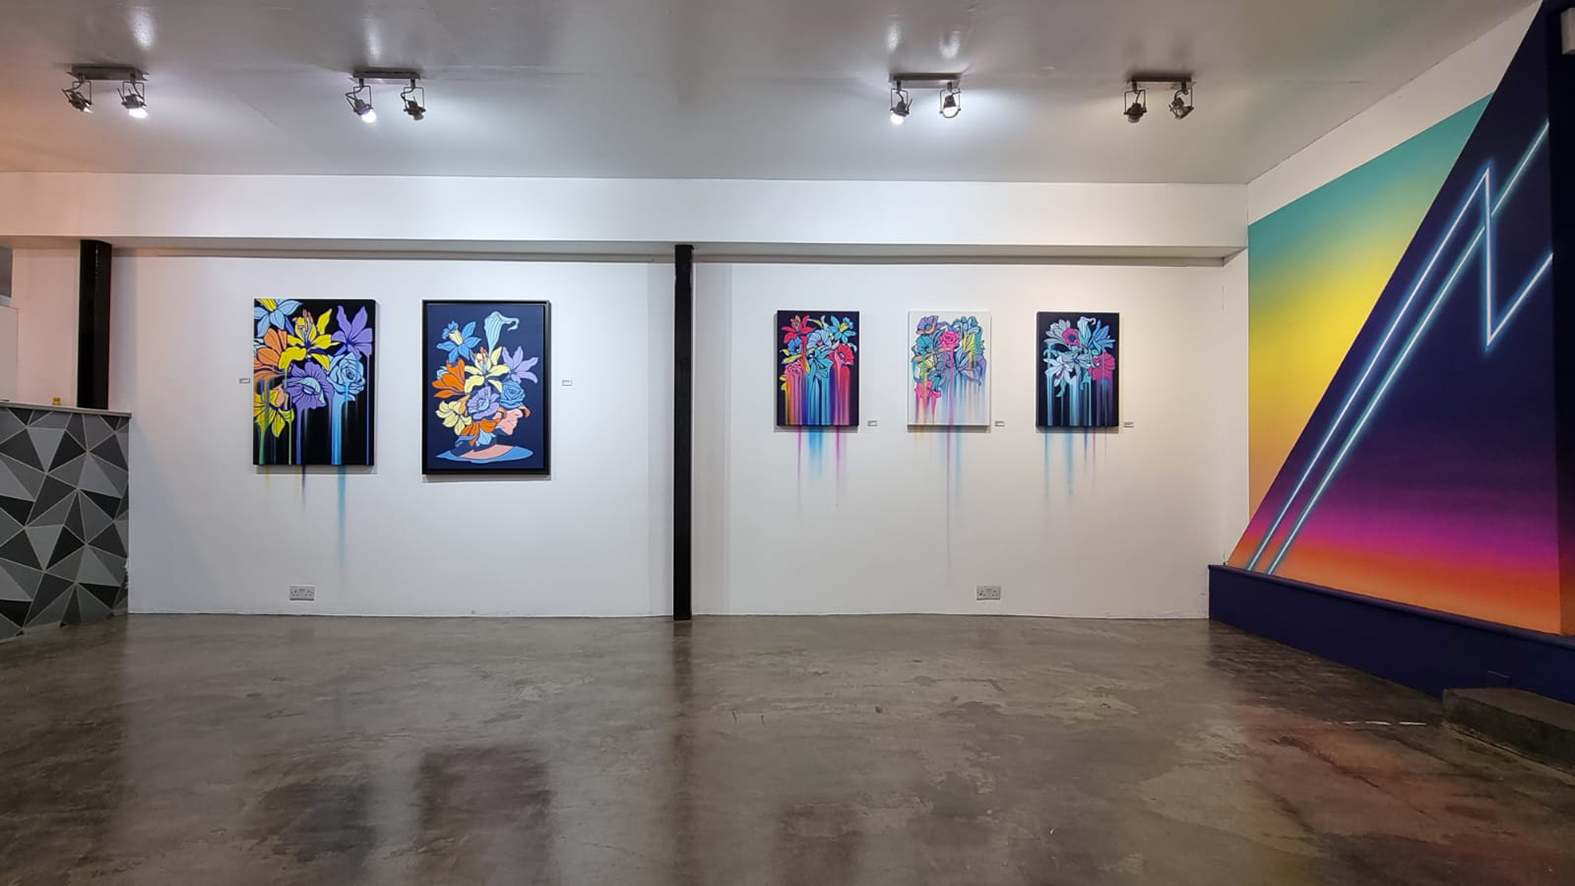 Nerone-futurstalgia-BSMT-gallery-5